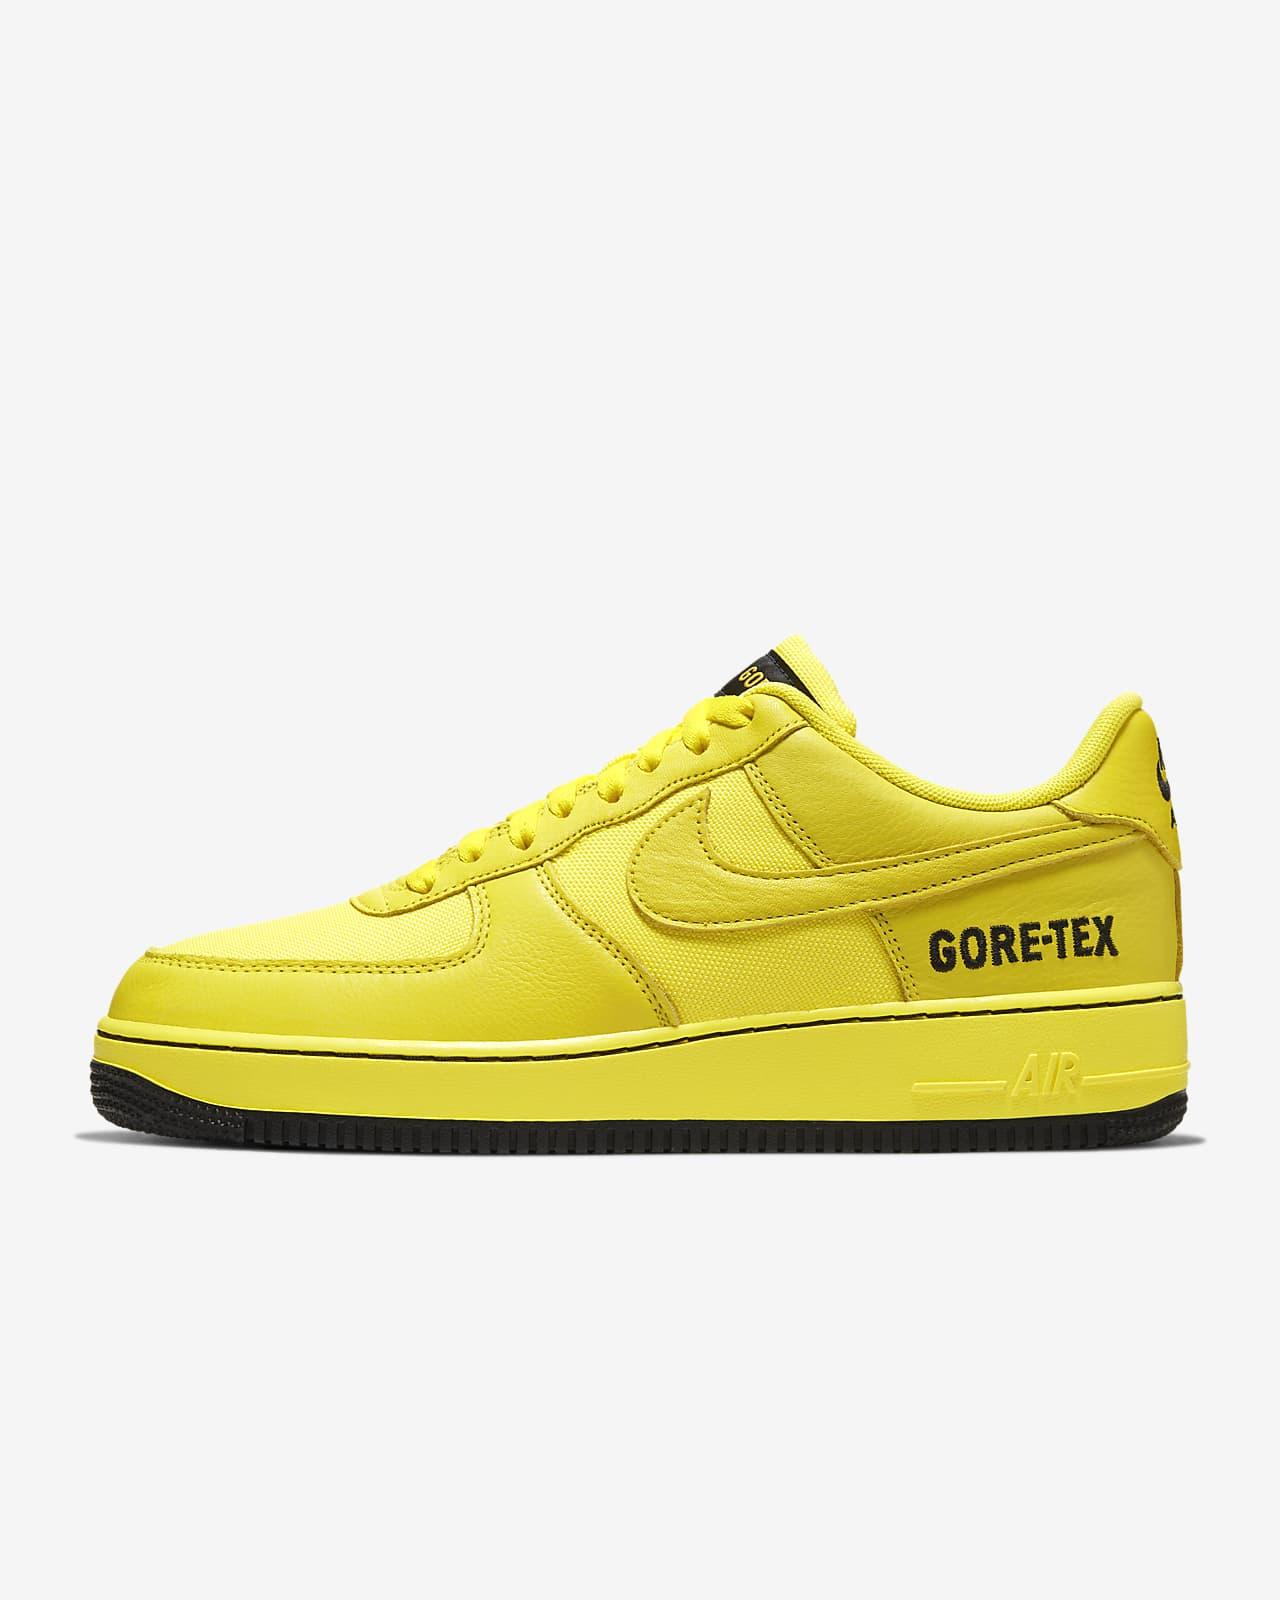 air max 1 amarillas